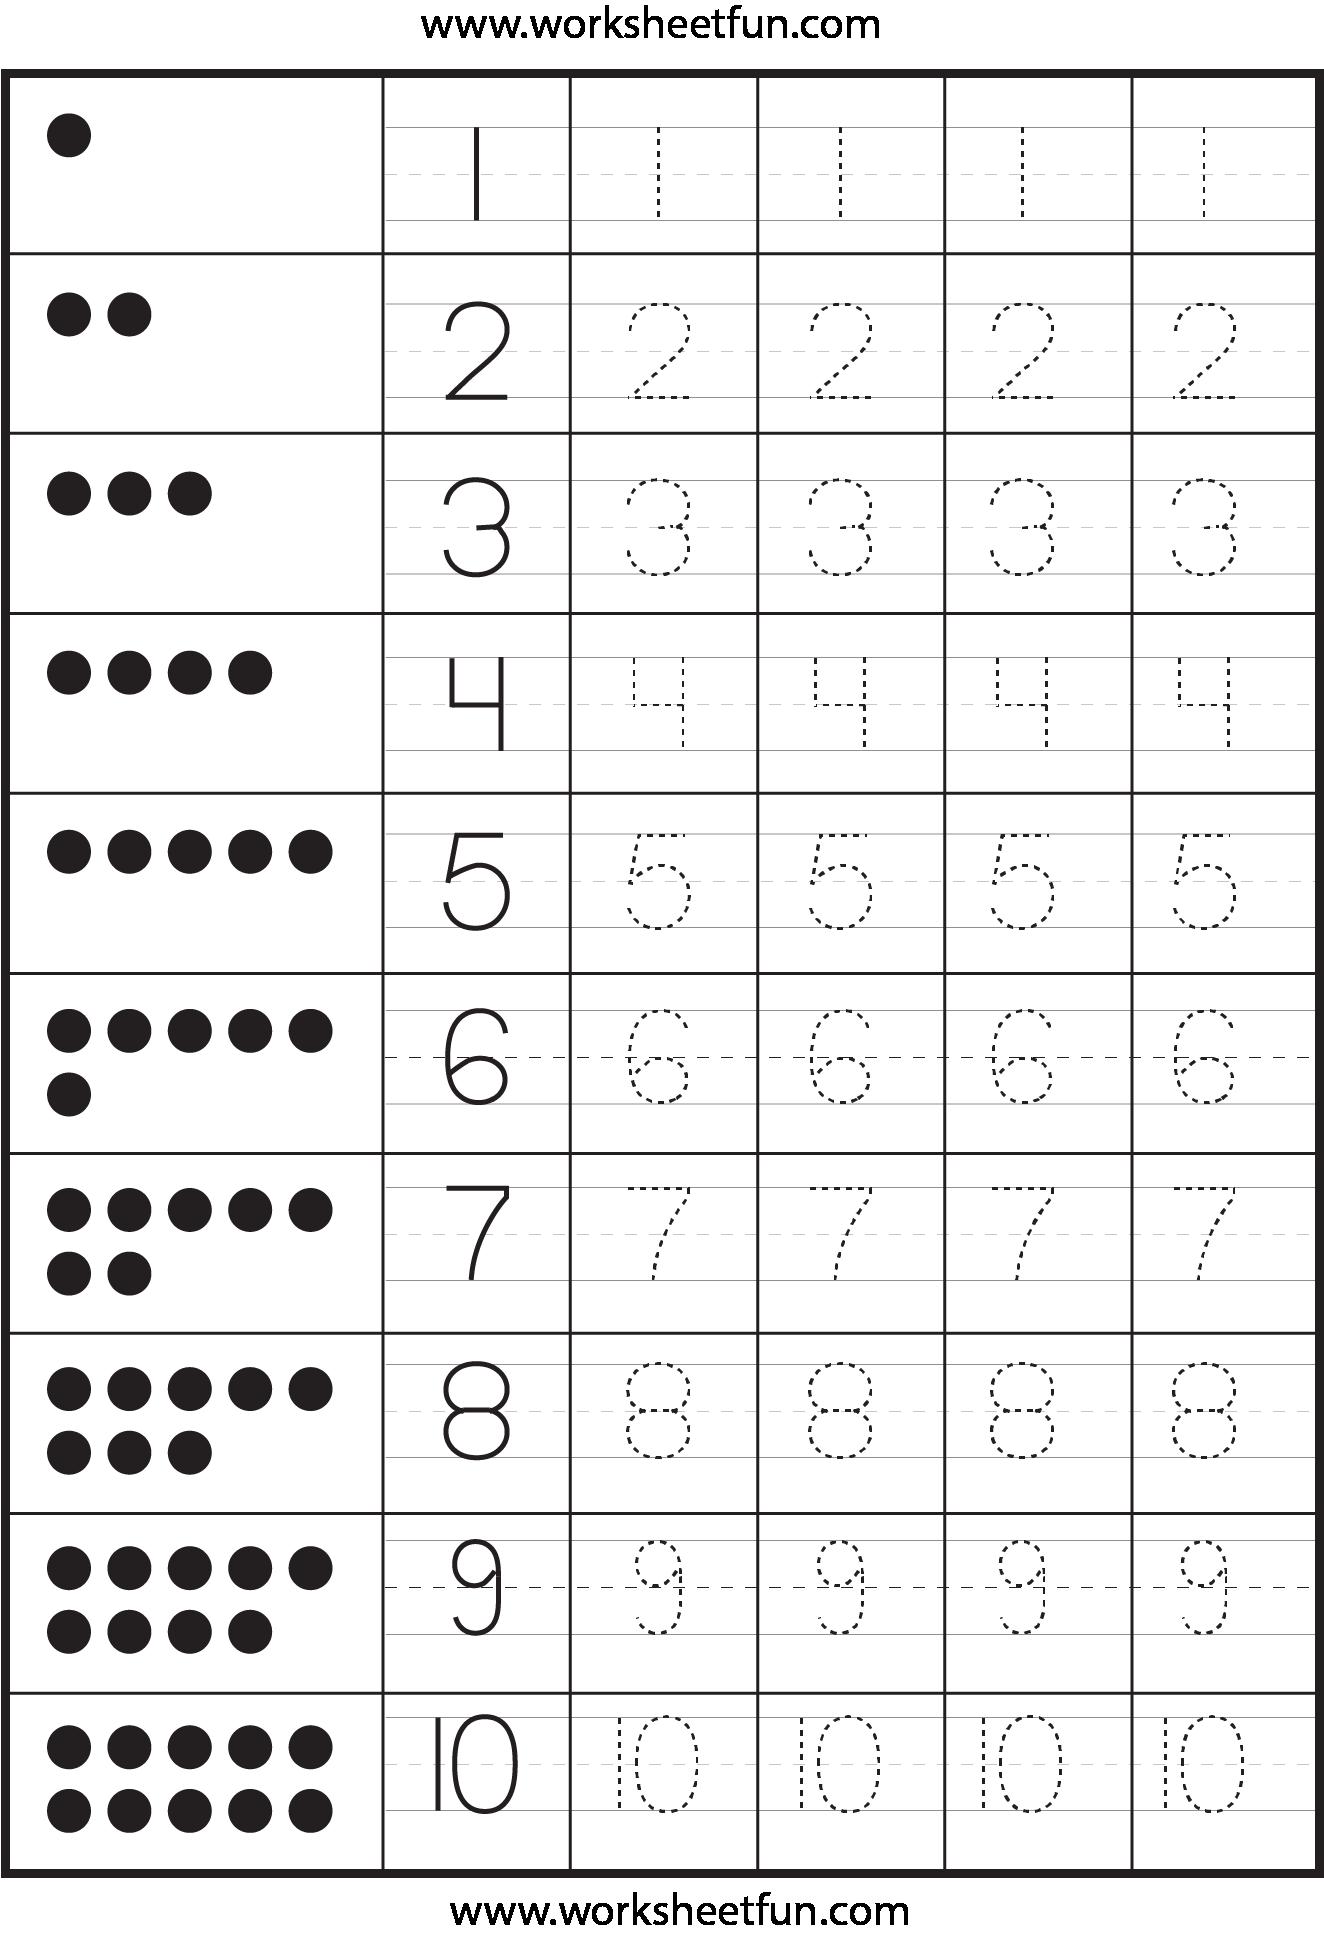 6 Best Images of Printable Number 10 Worksheet - Writing Number 10 ...